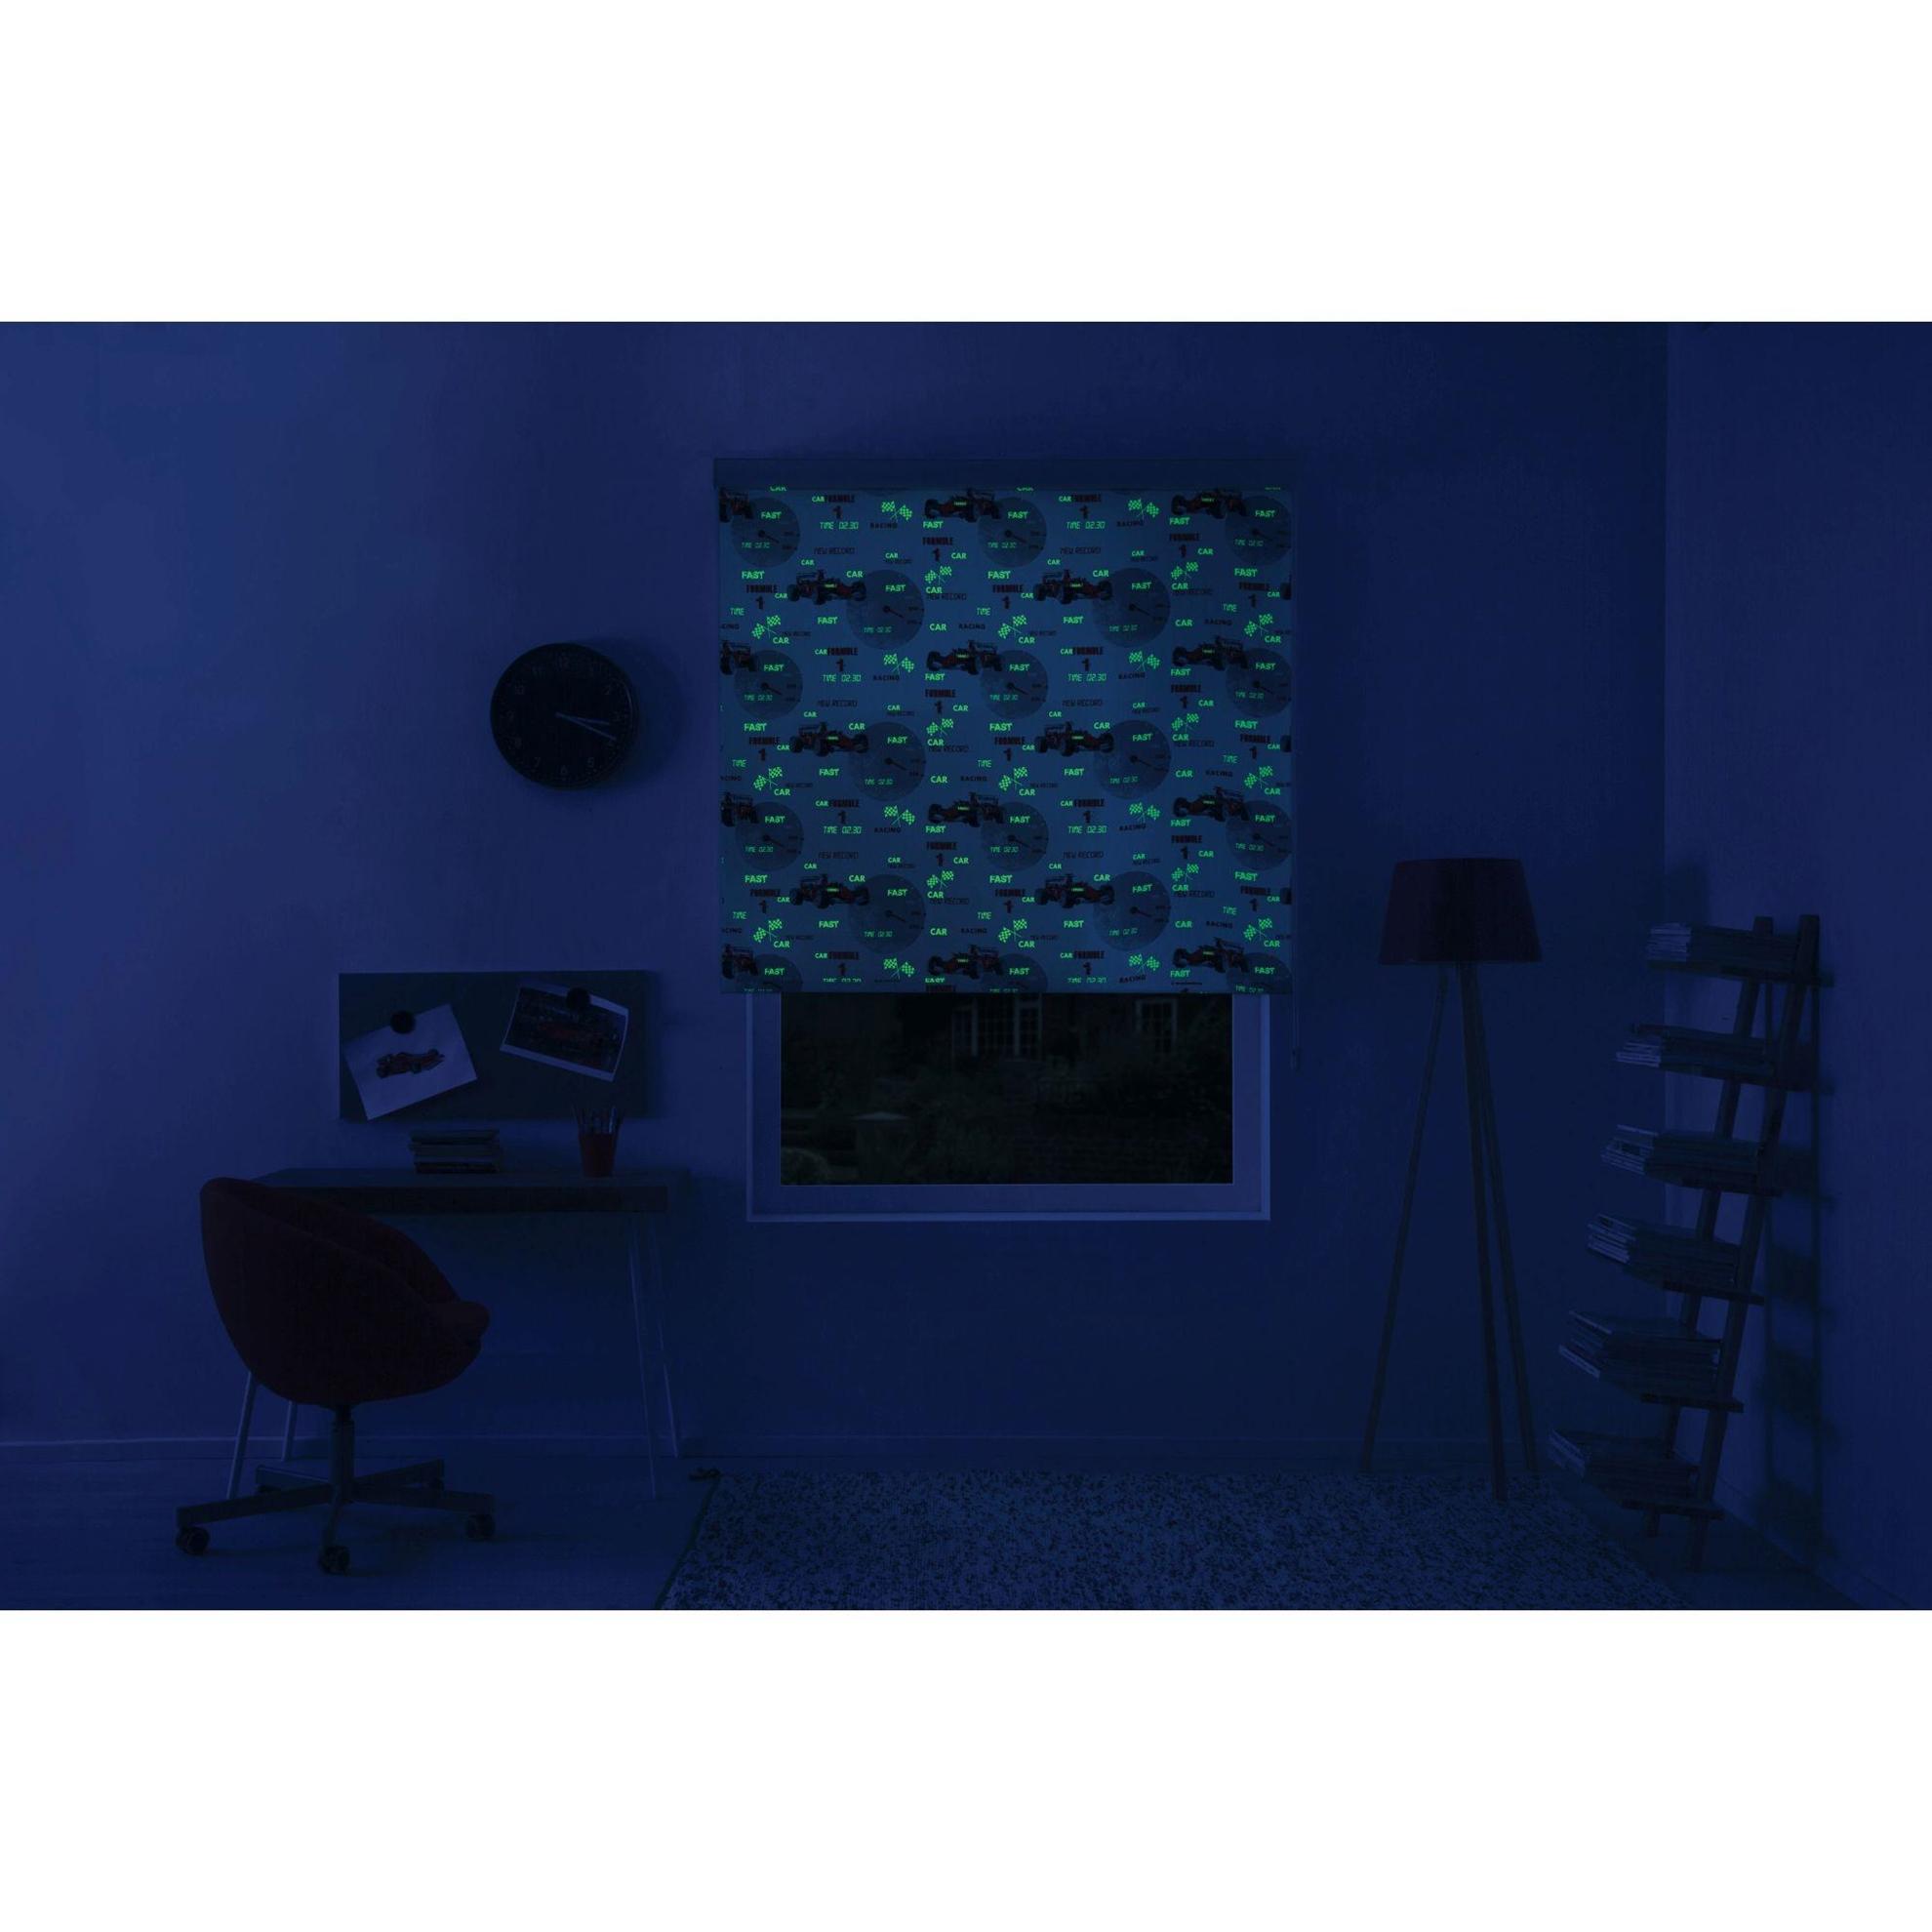 resm Taç  Araba Glow Stor / 132TL (m²)